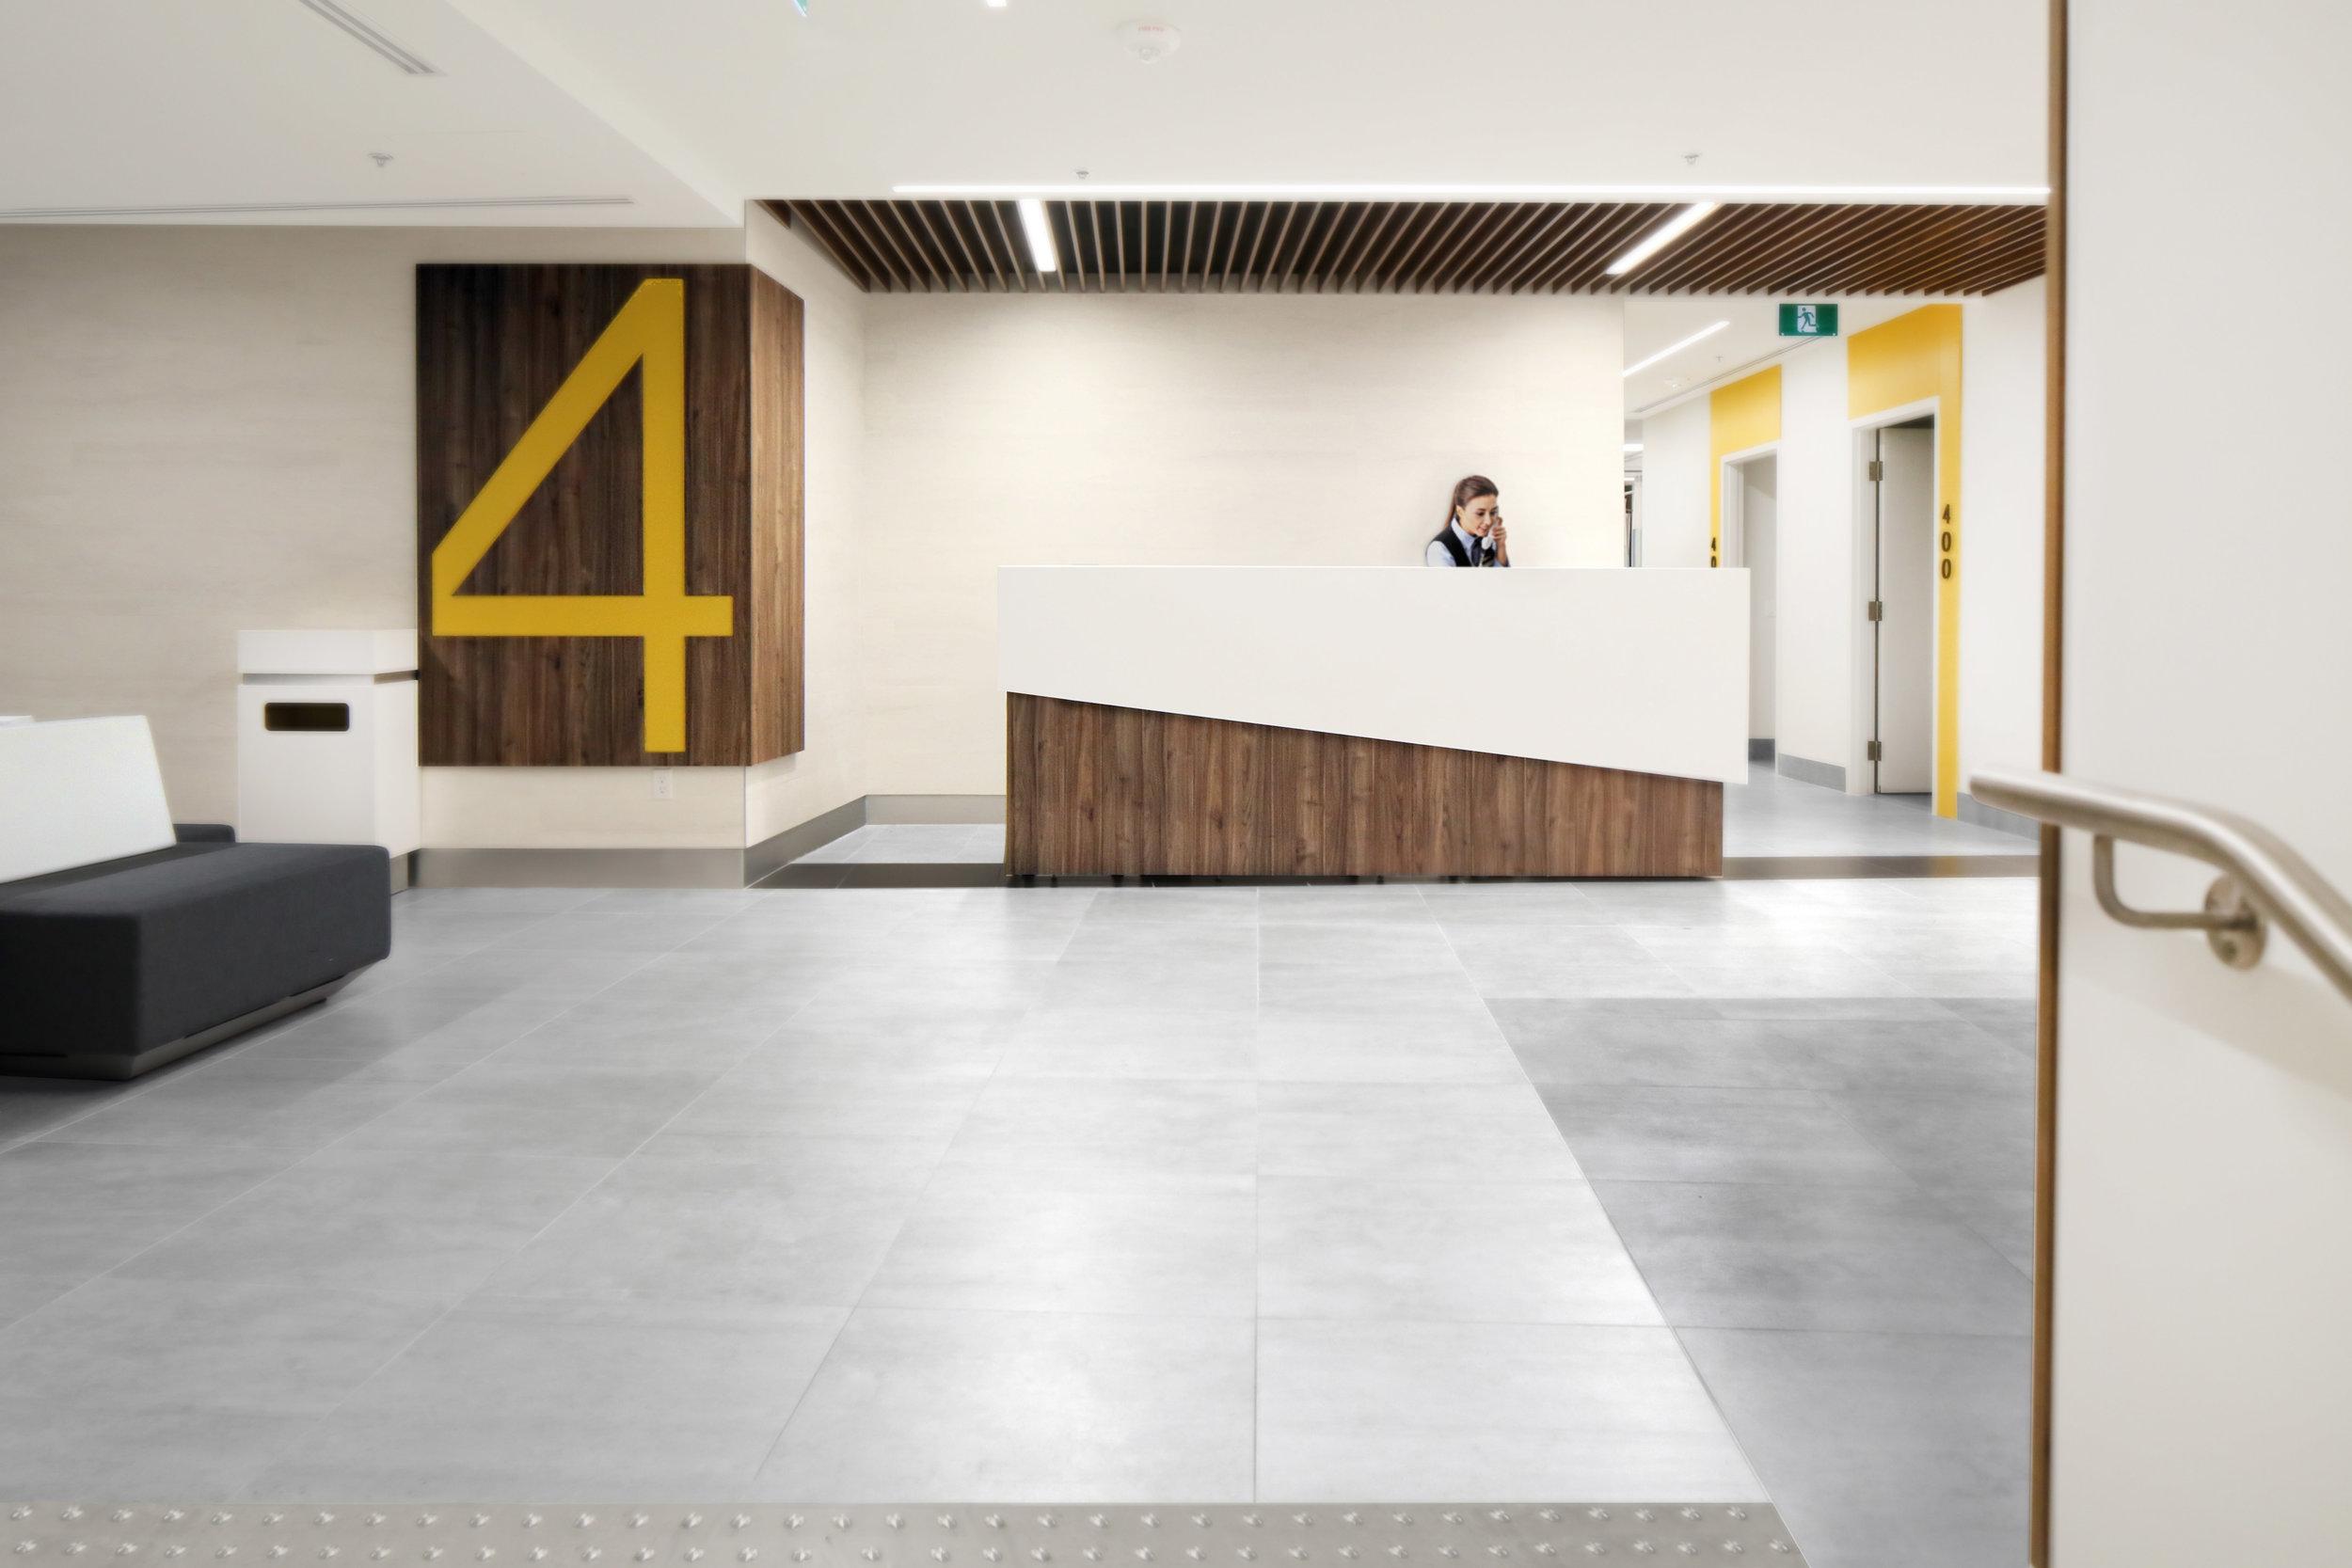 Canada_Toronto_Healthcare_Cardiology_Design_architect_pod4-reception2.jpg.jpg